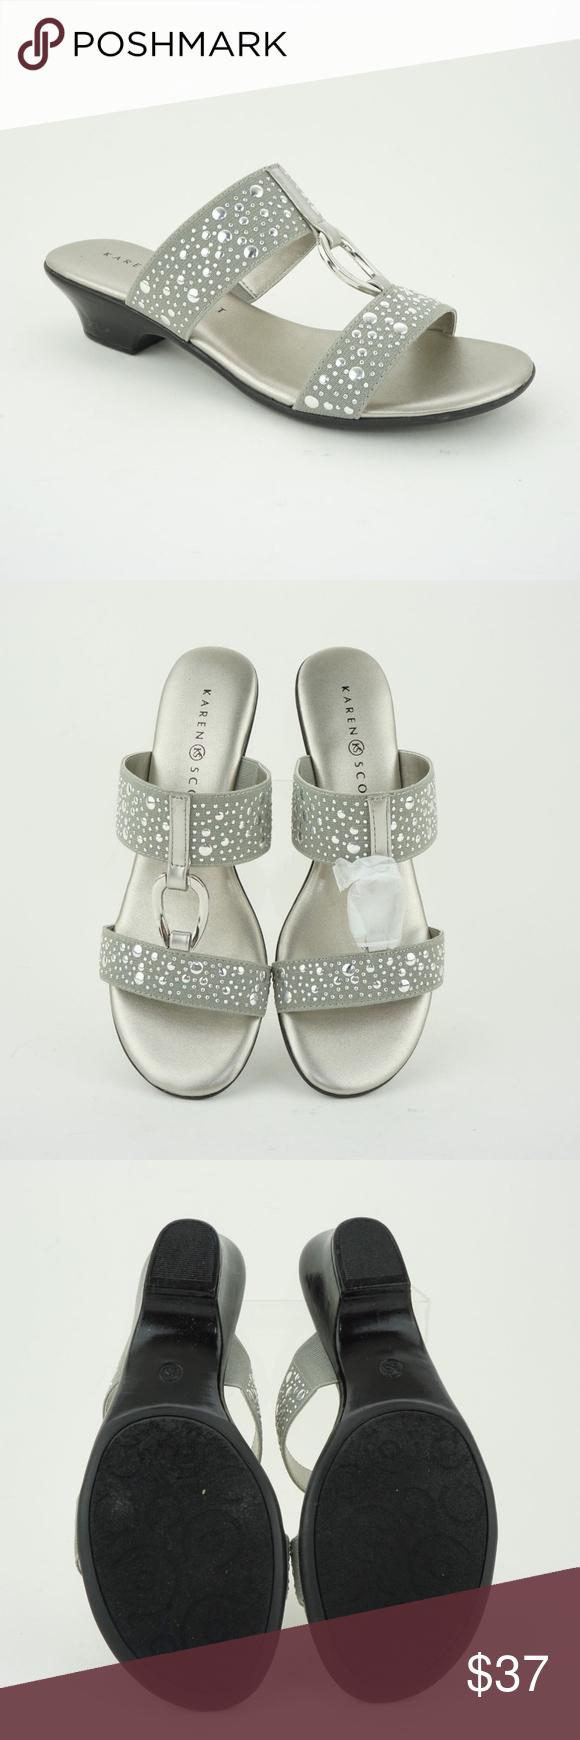 ad14c3d684c5b Karen Scott Eanna Slip-On Sandals Silver Karen Scott Womens' (Sz 6.5 ...